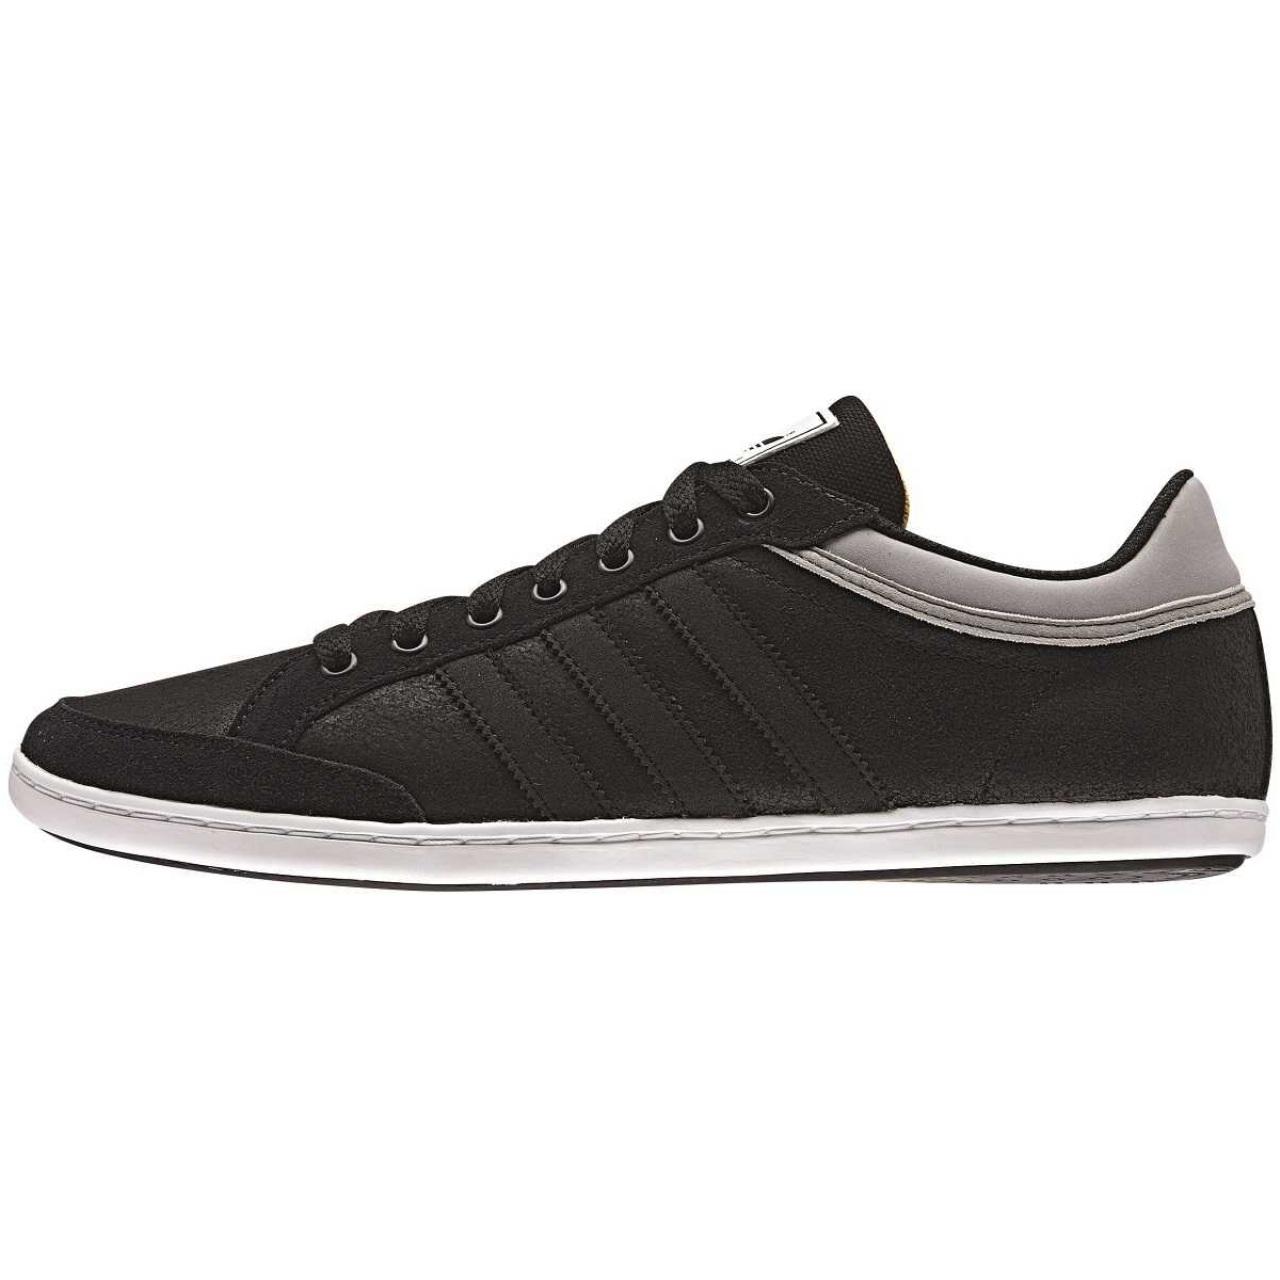 Adidas Originals Plimcana Low Herren Damen Schuhe Sneaker ...